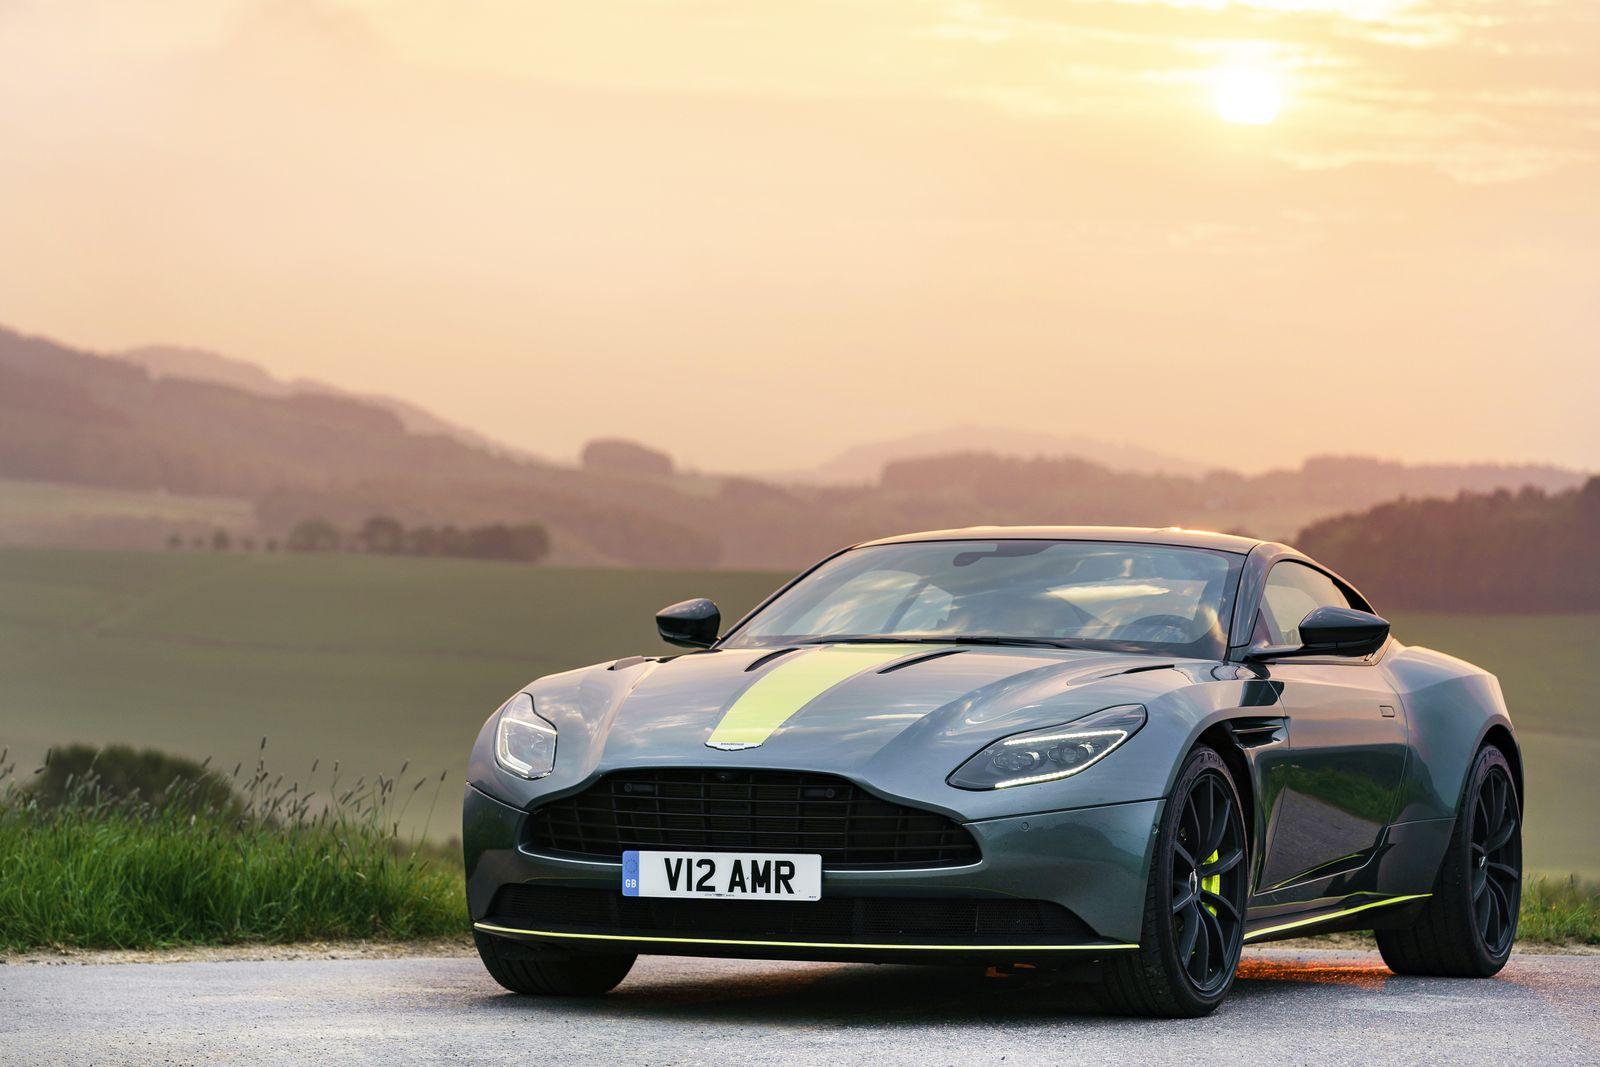 2018 / Aston Martin DB11